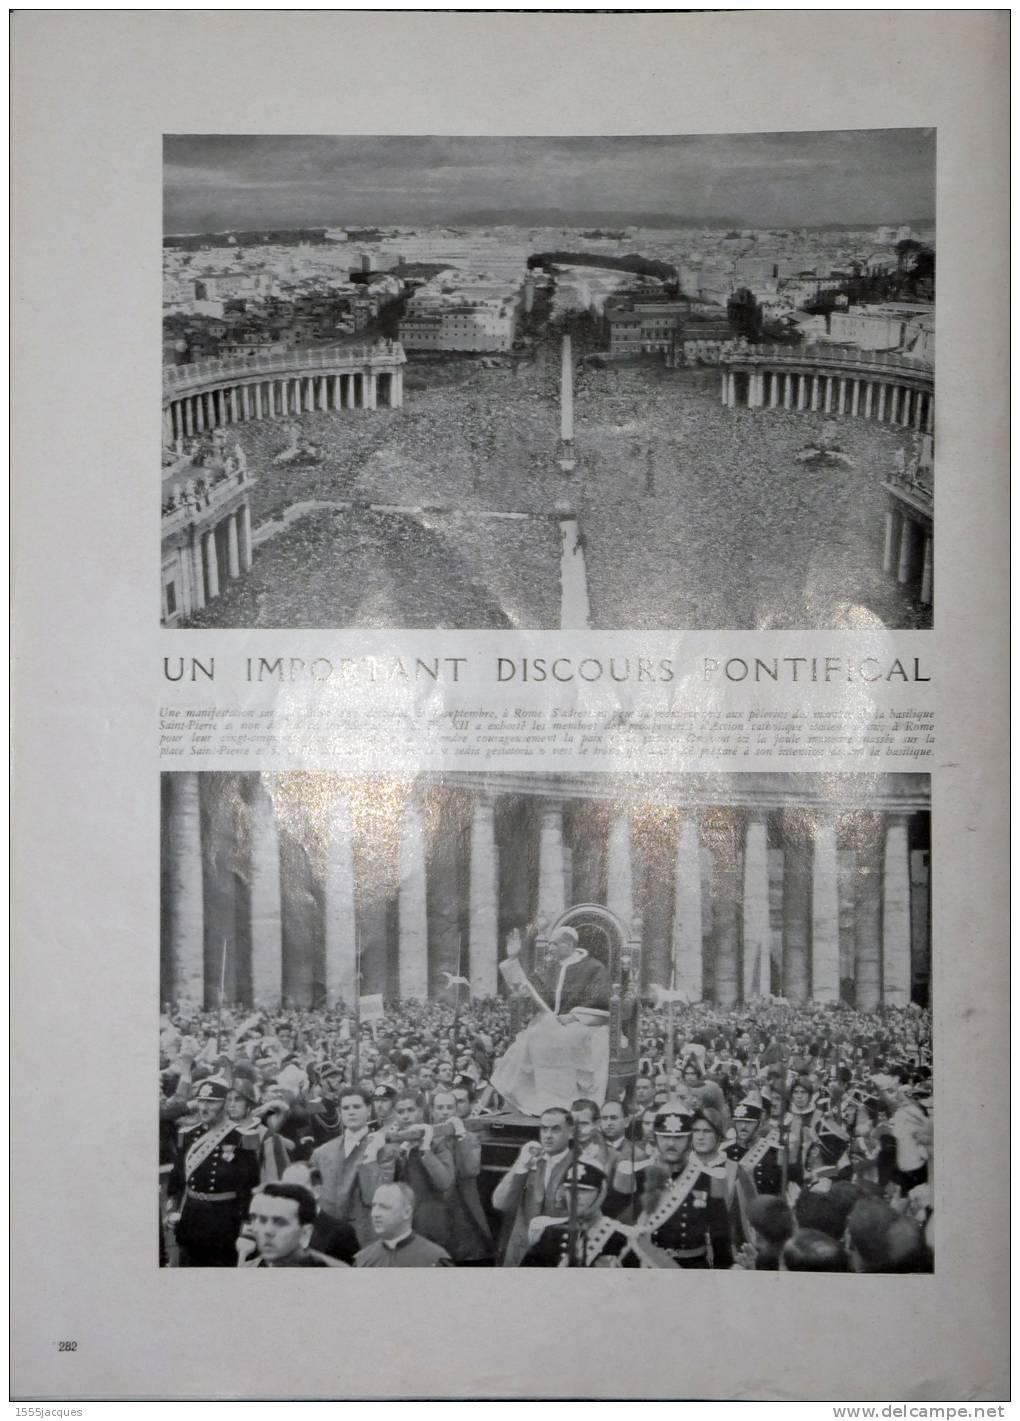 FRANCE ILLUSTRATION N° 103 / 20-09-1947 ROUEN LOUISIANE MARINE FRANÇAISE PIE XII MARÉCHAL LYAUTEY LANDES BARRÈGES EXODUS - Giornali